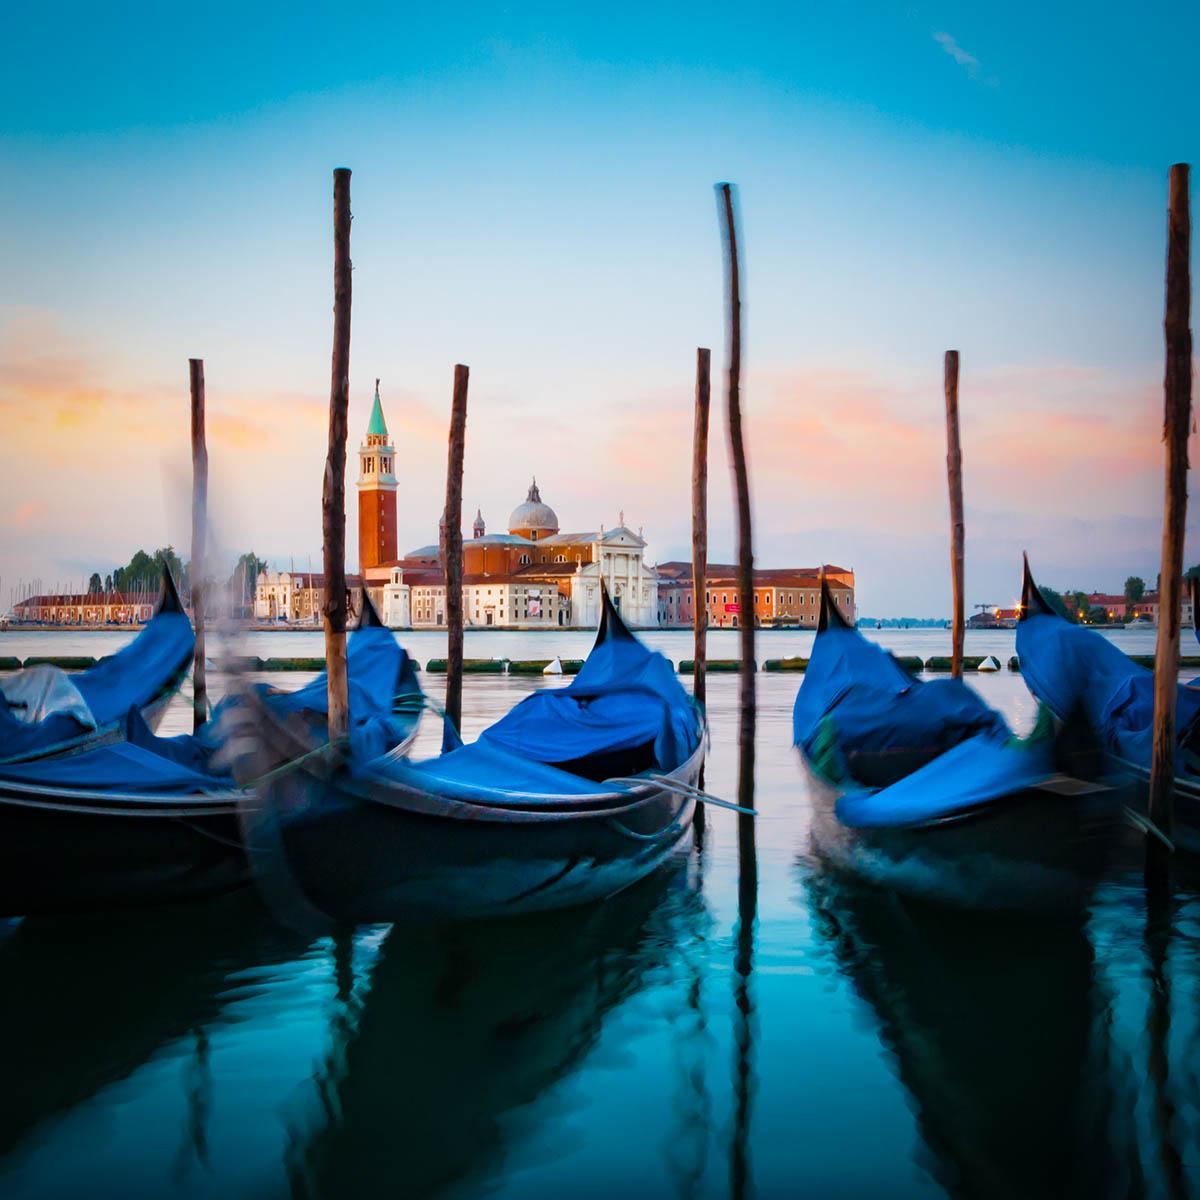 tourist free photography - Venetian gondolas